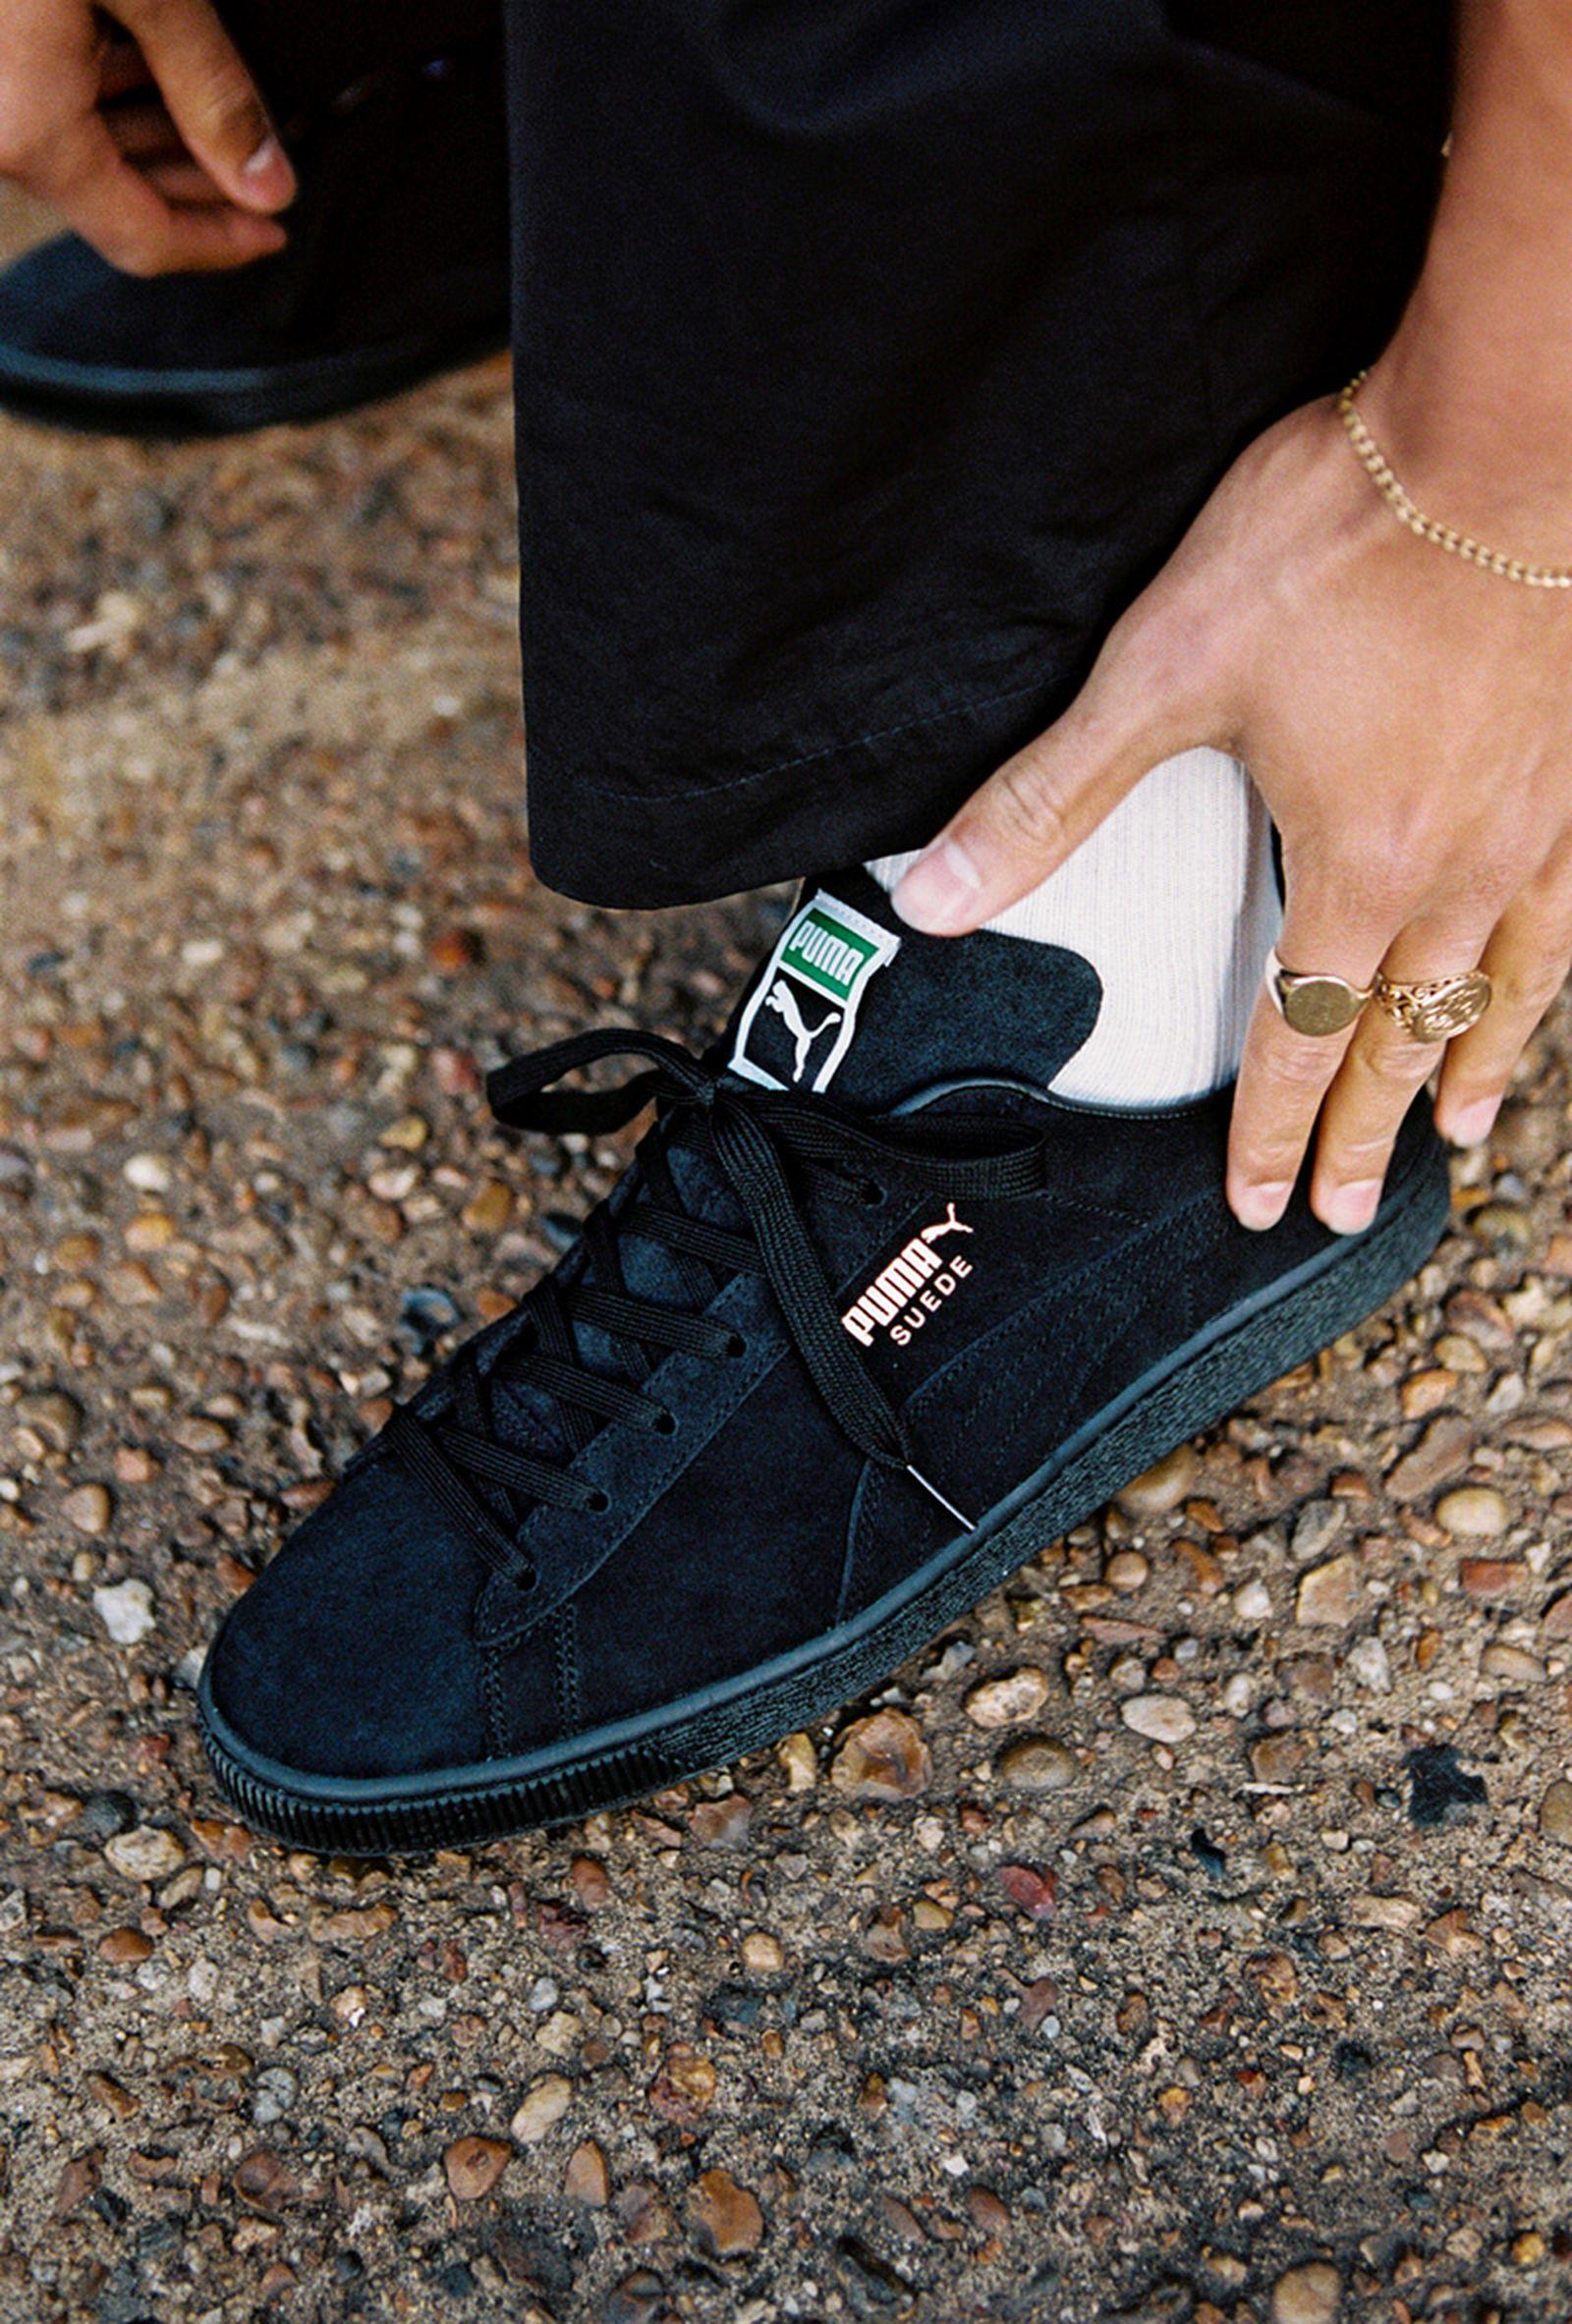 uk-breakers-puma-suede-b-boy-global-dance-sneaker-04